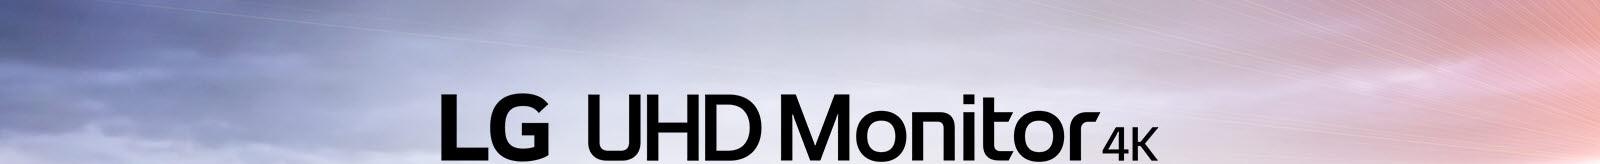 LG UHD Monitor 4K